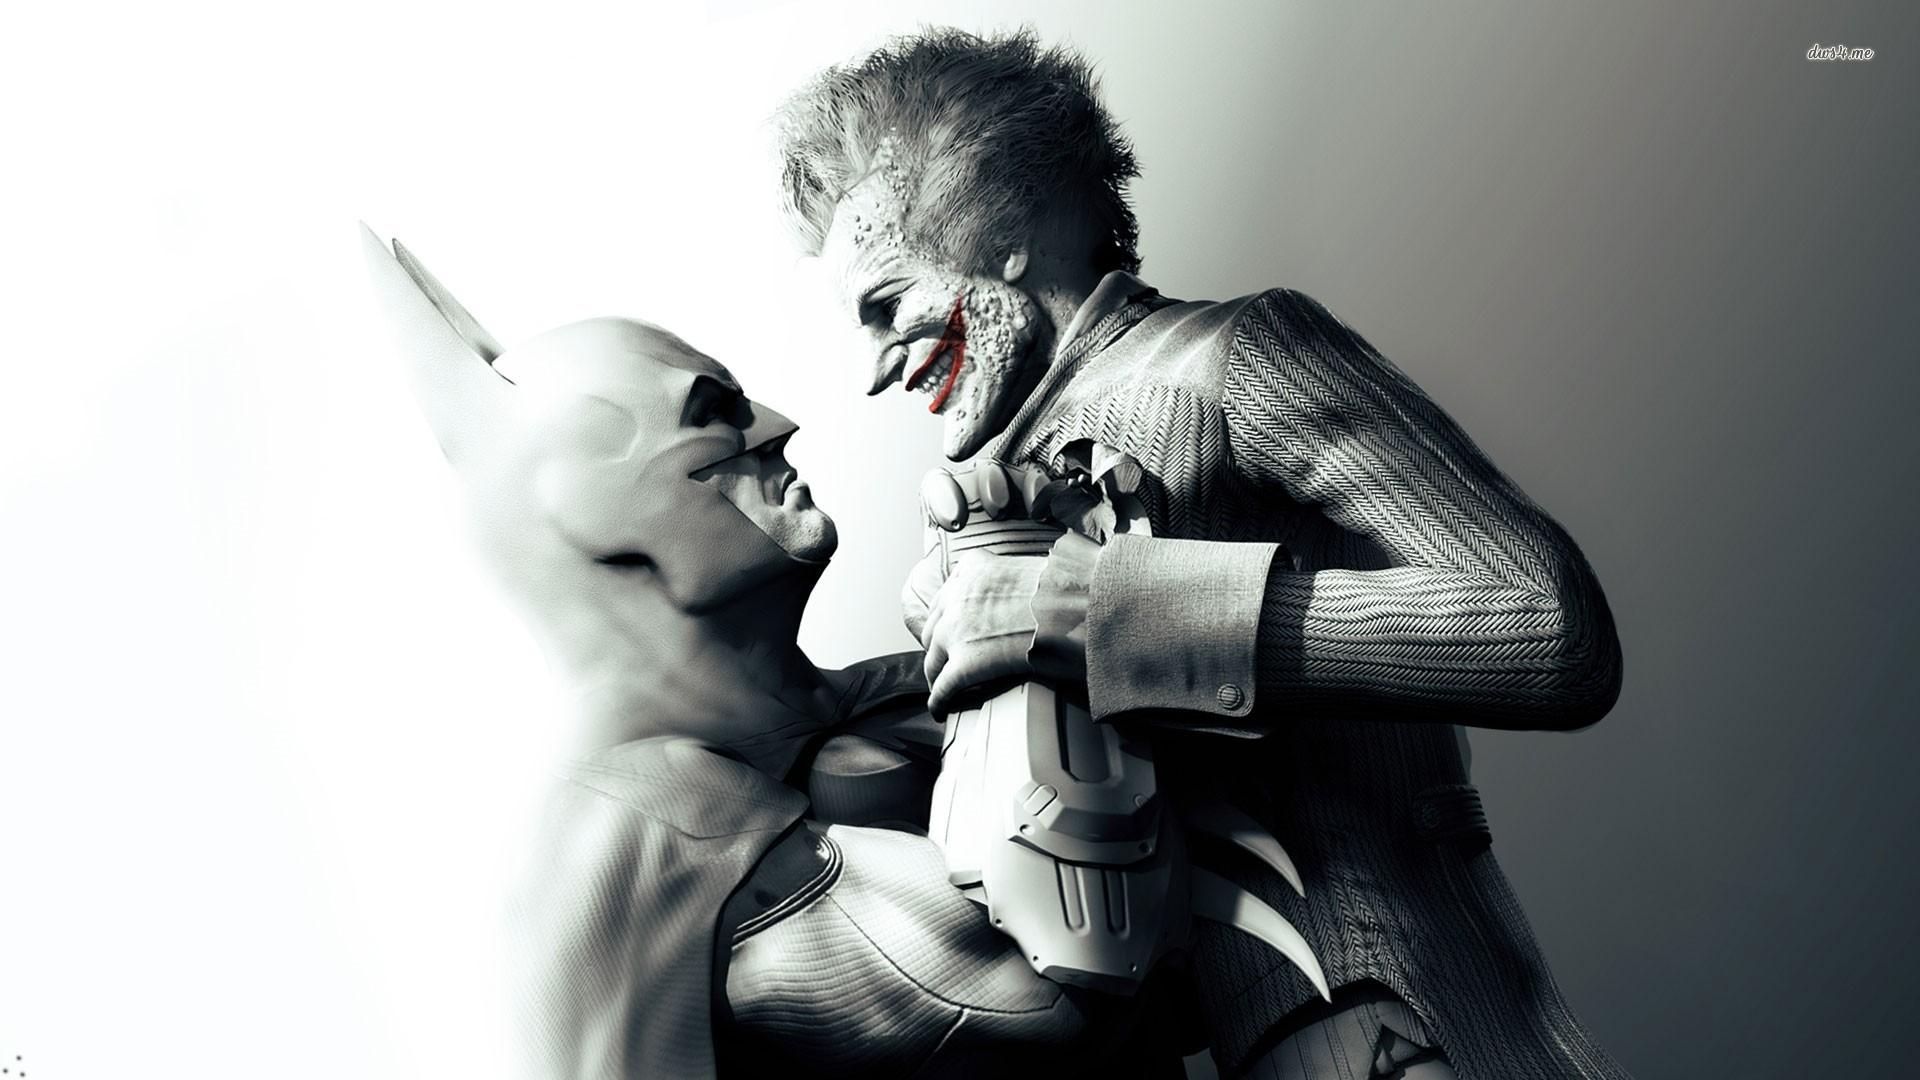 batman vs joker wallpaper - sf wallpaper